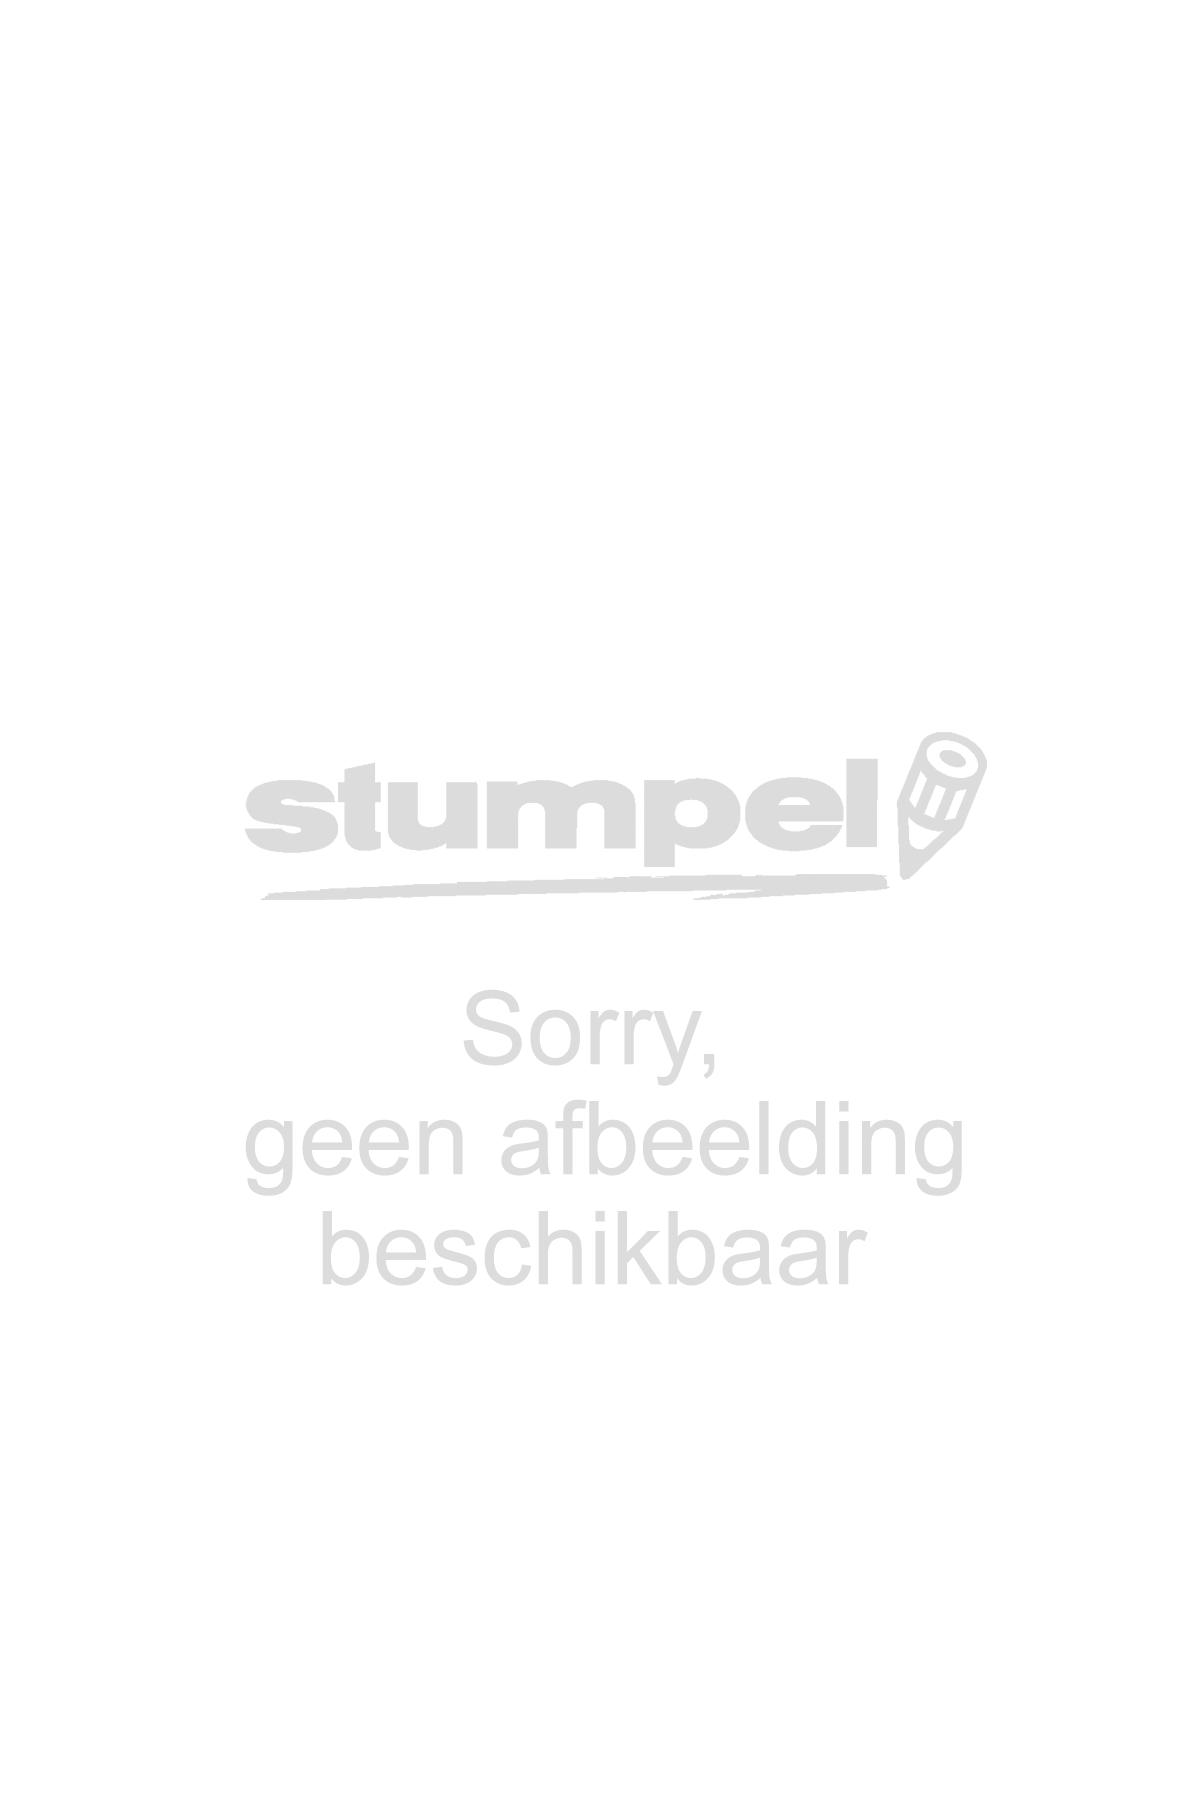 rembrandt-aquarelverf-penseel-serie-110-nr-1-10080646